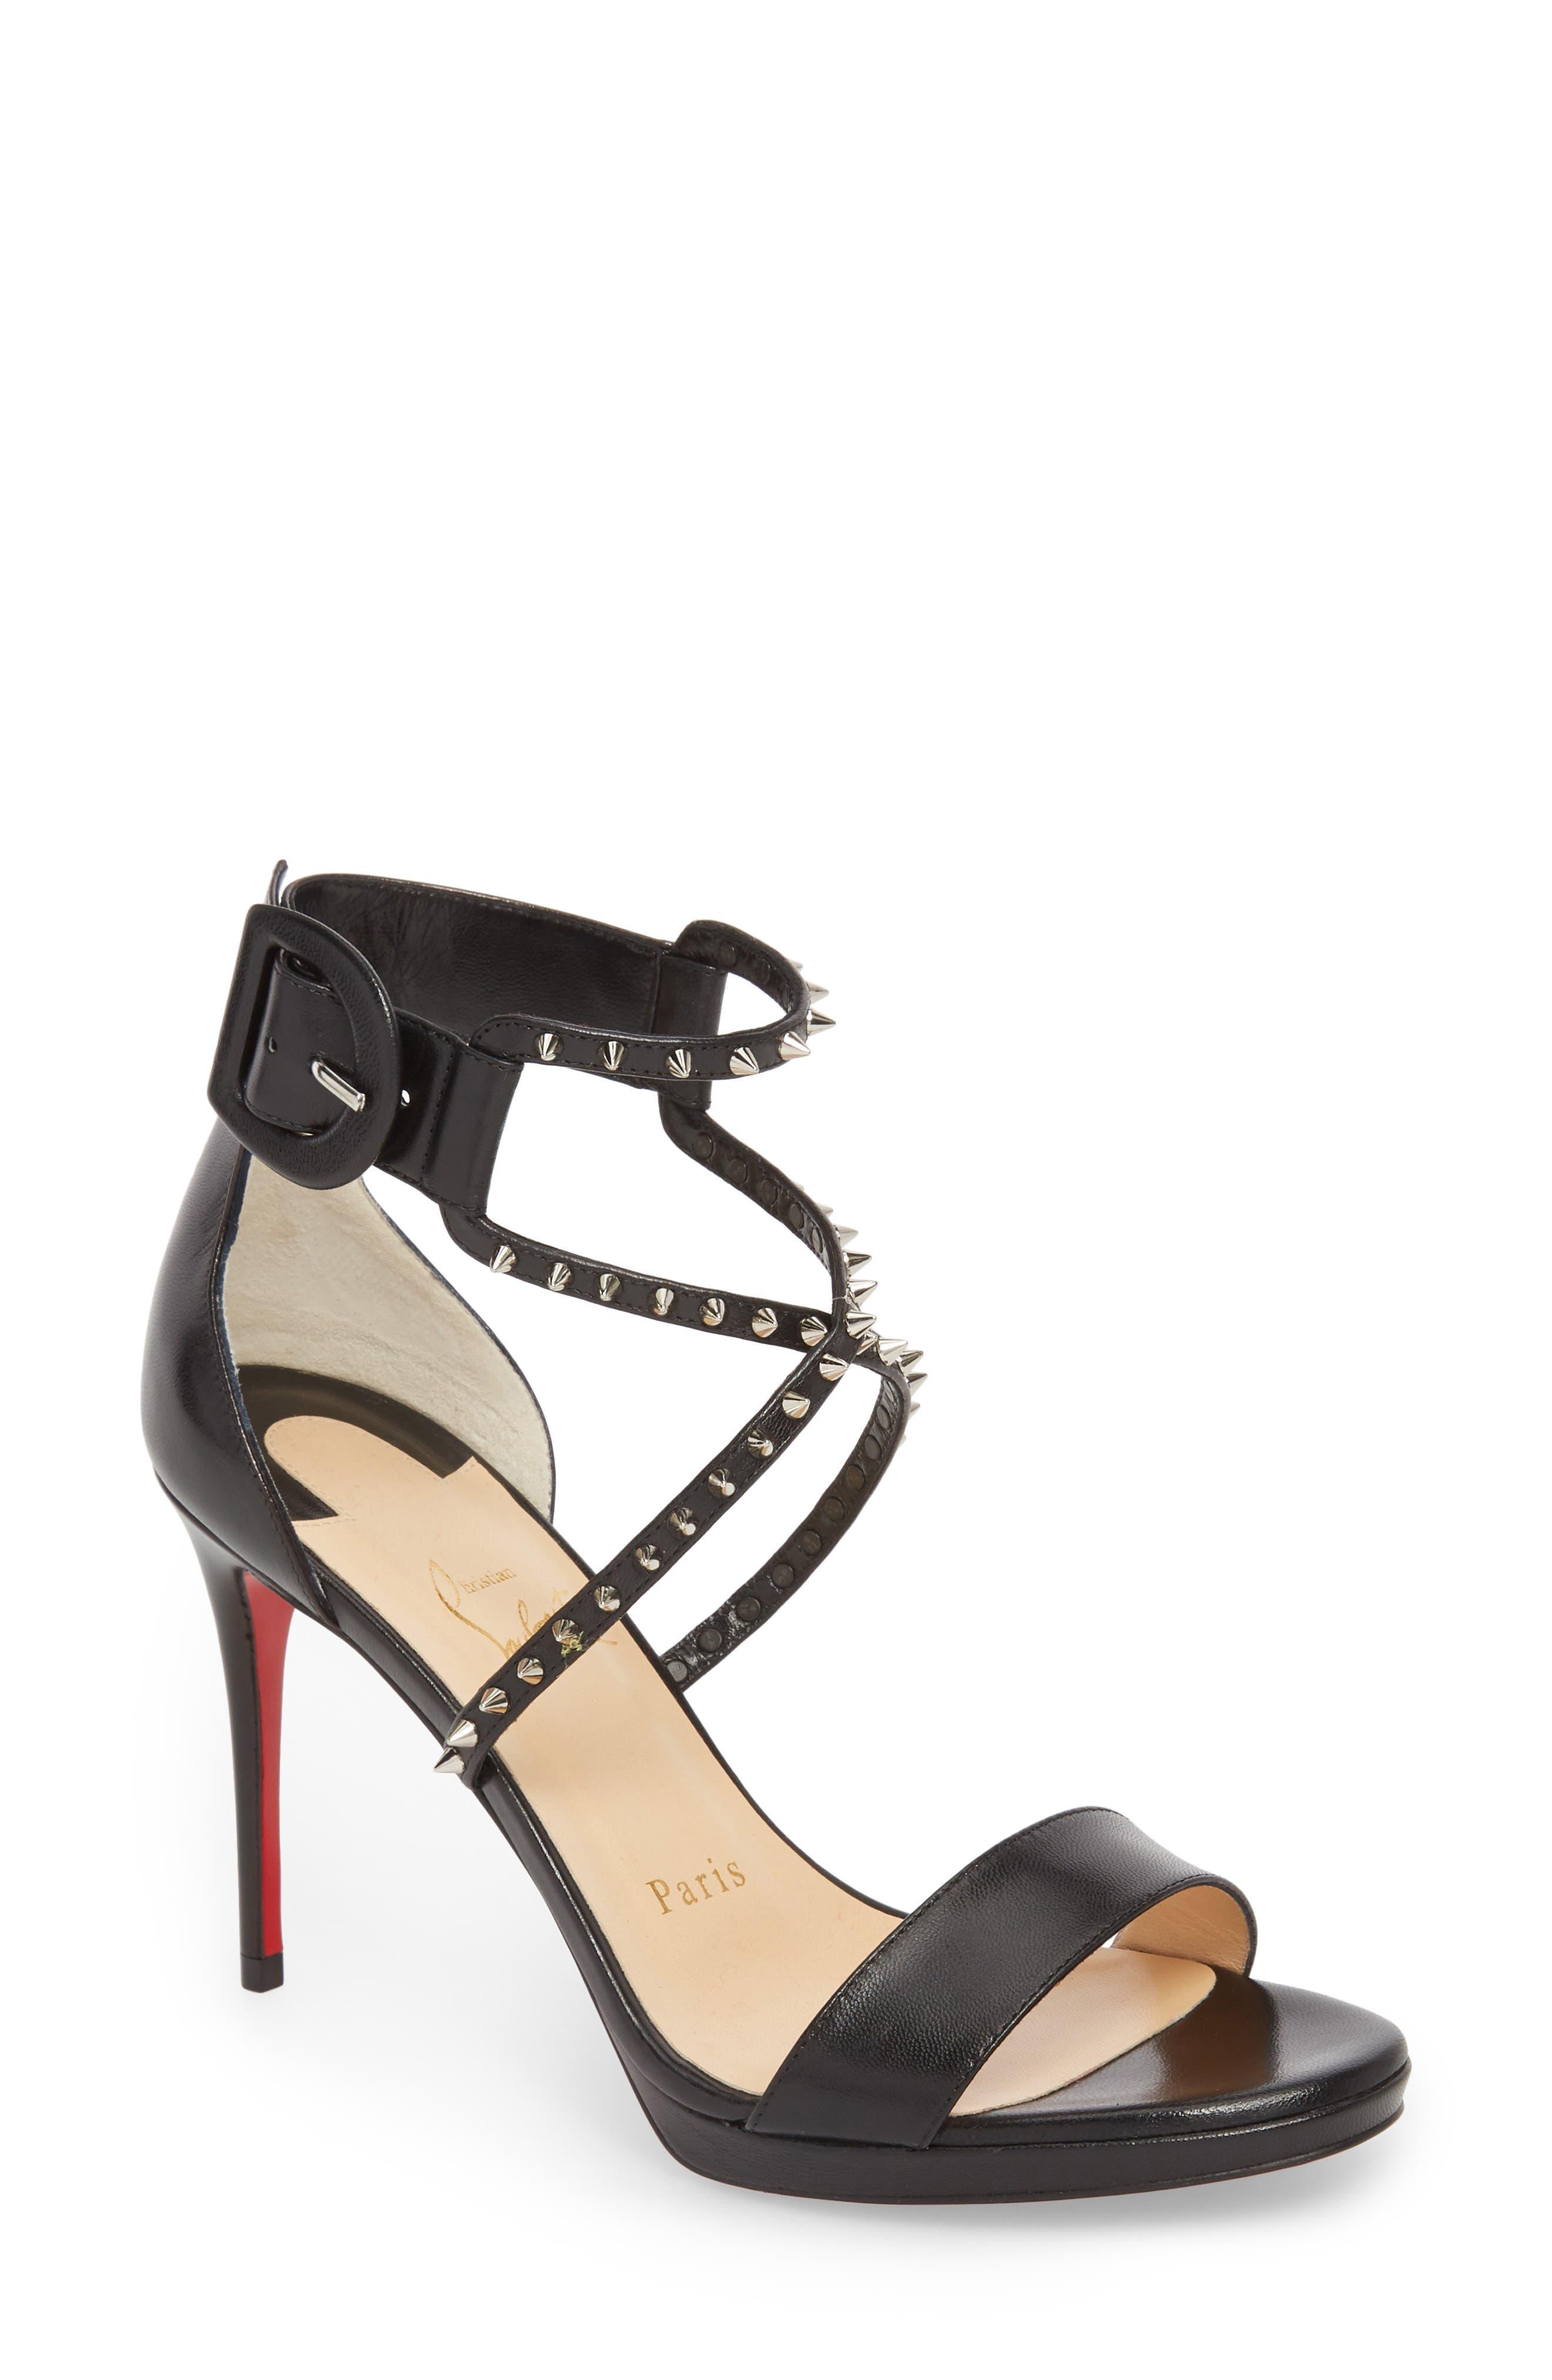 Choca Lux Spiked Sandal,                             Main thumbnail 1, color,                             BLACK